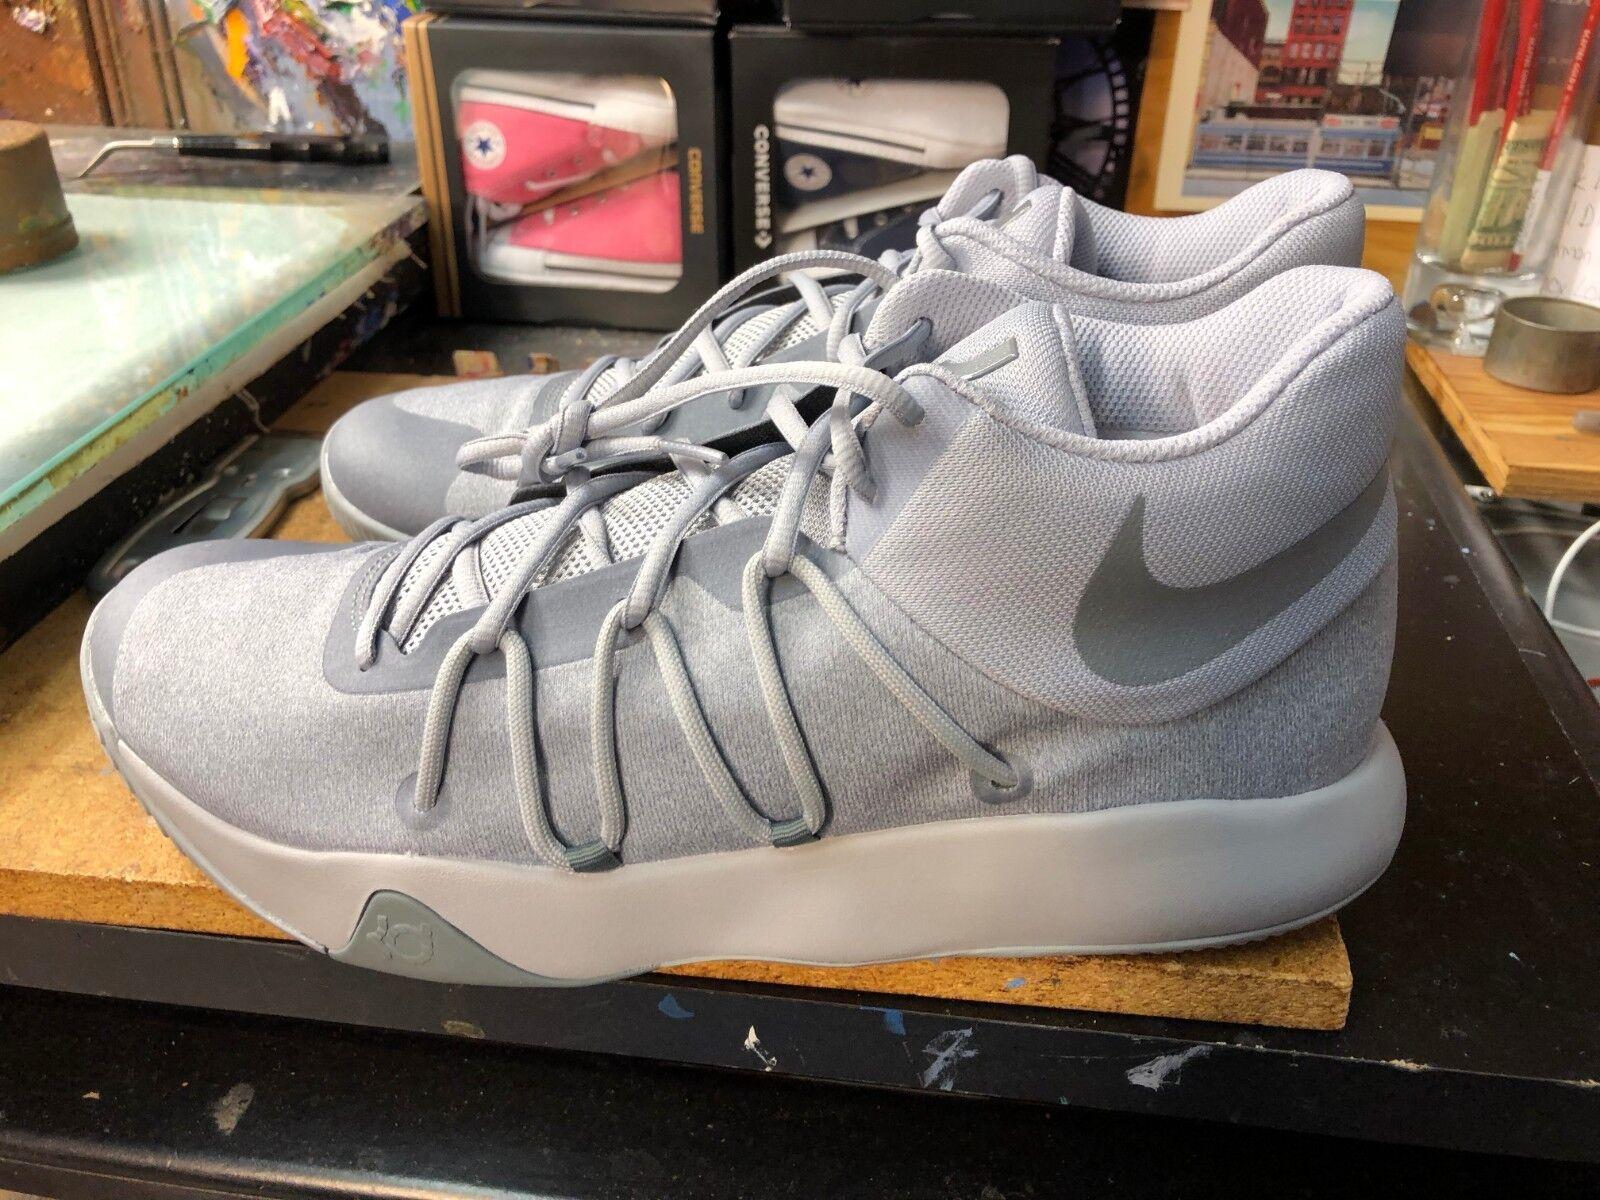 Nike KD Trey 5 V Wolf Grey Cool Grey Size US 11 Men's 897638 011 Kevin Durant